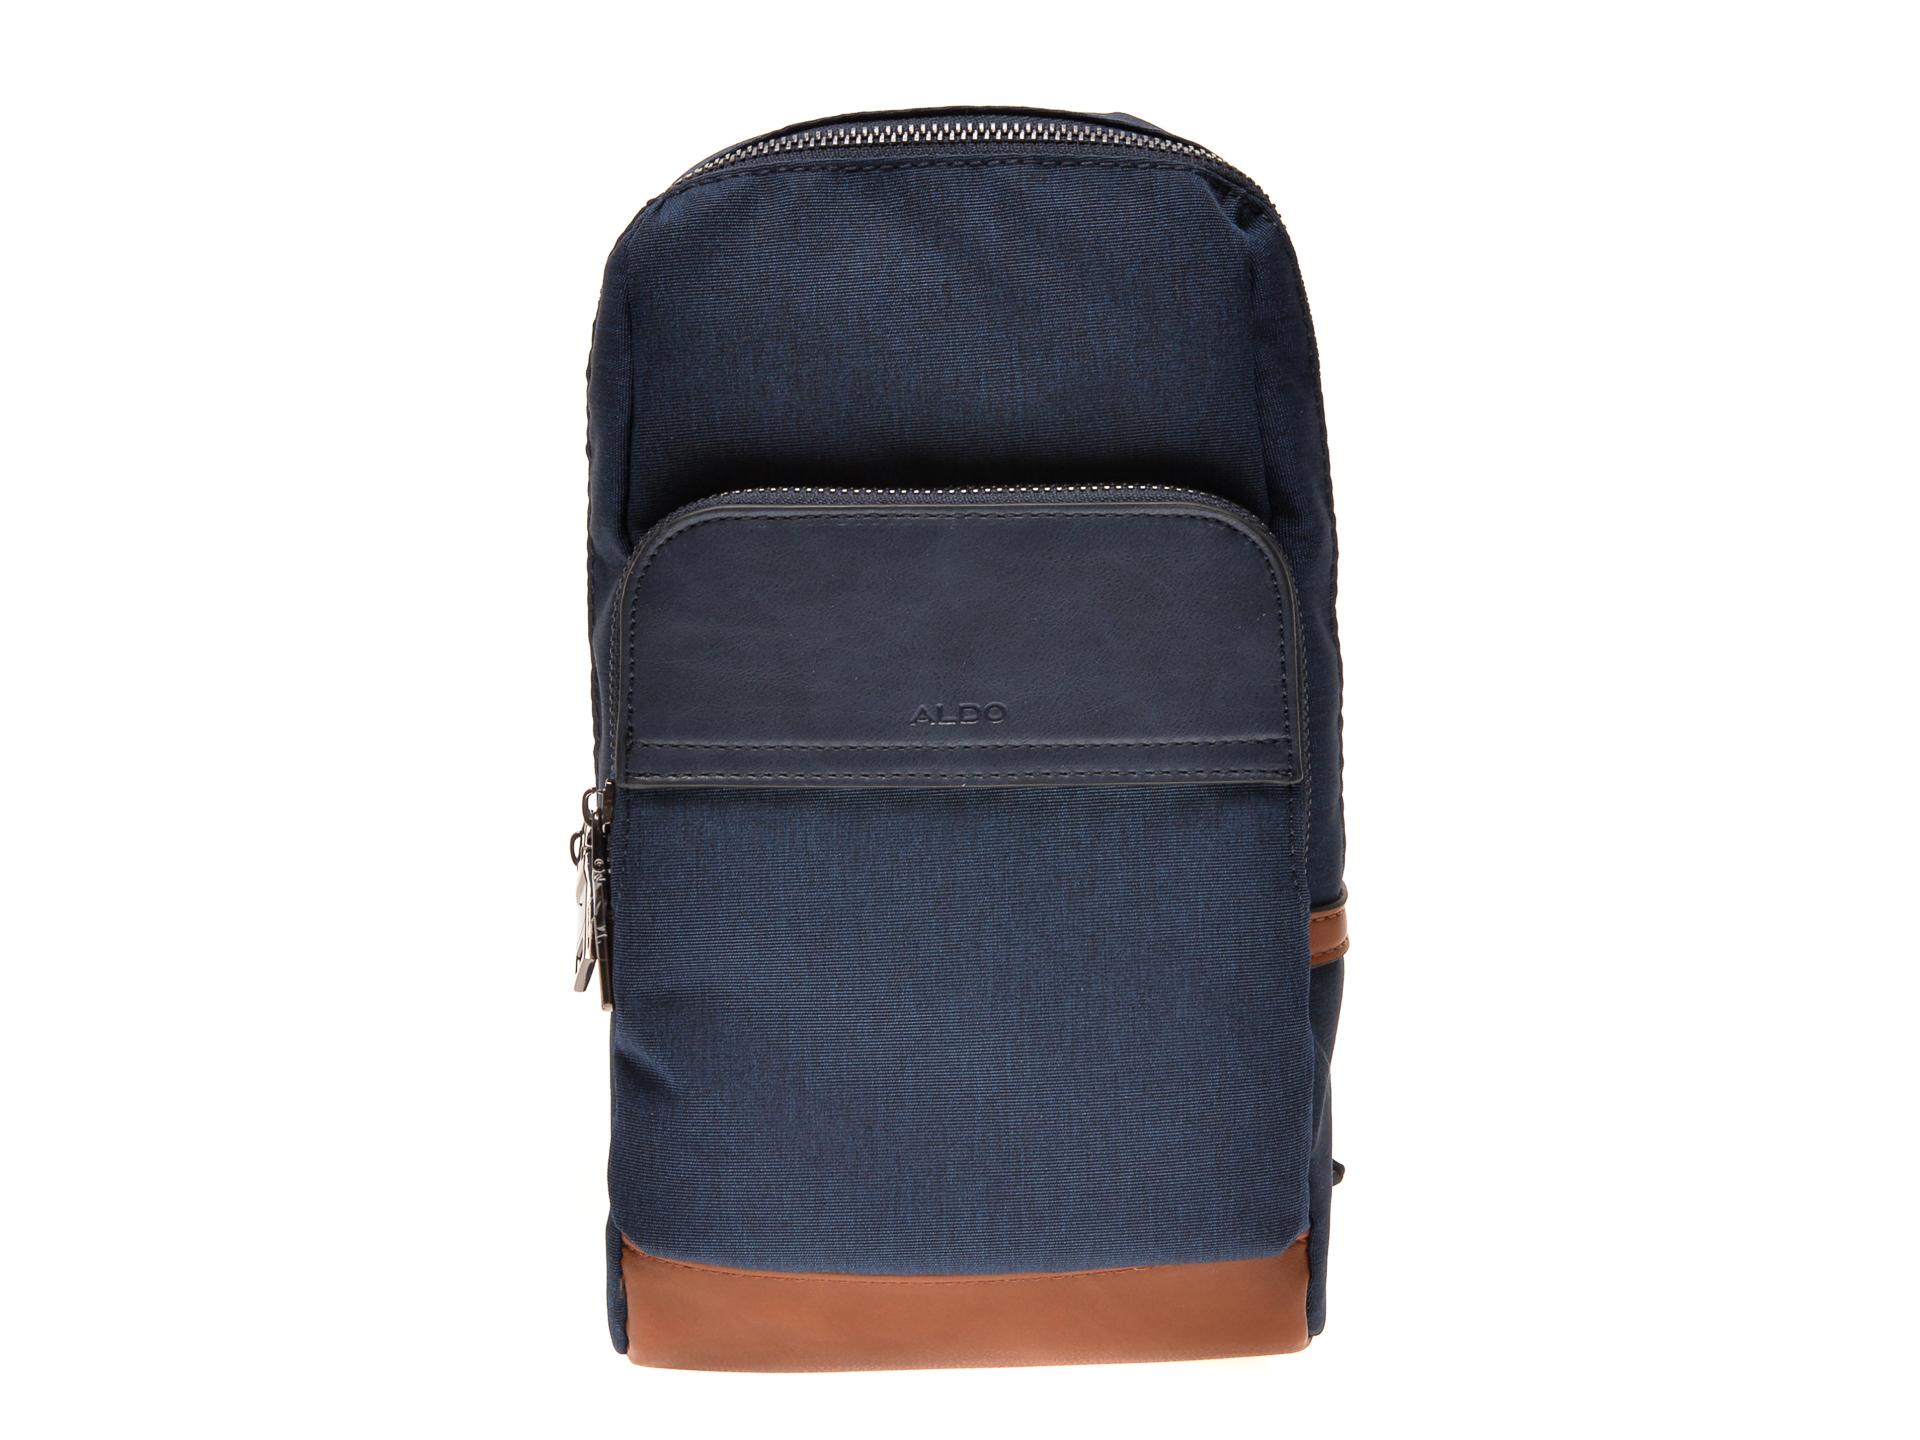 Geanta ALDO bleumarin, Marchat410, din material textil